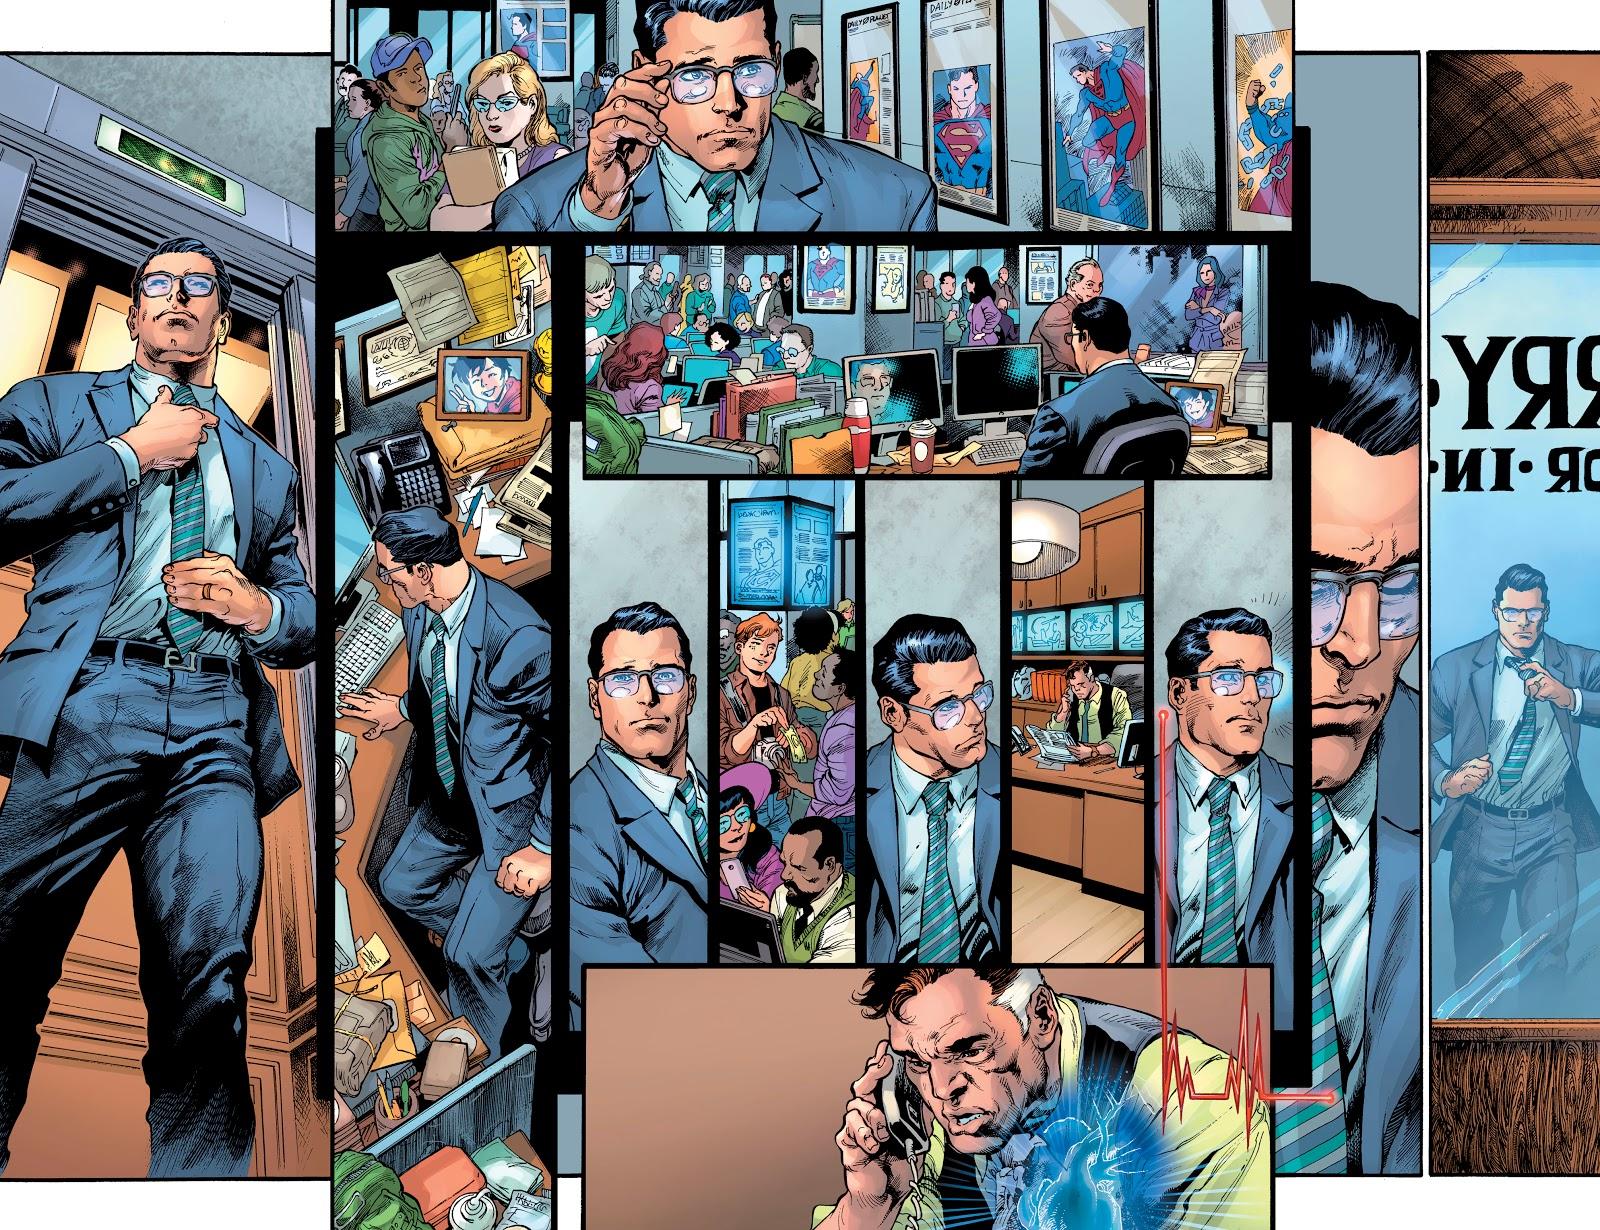 Clark Kent Tells Perry White He's Superman